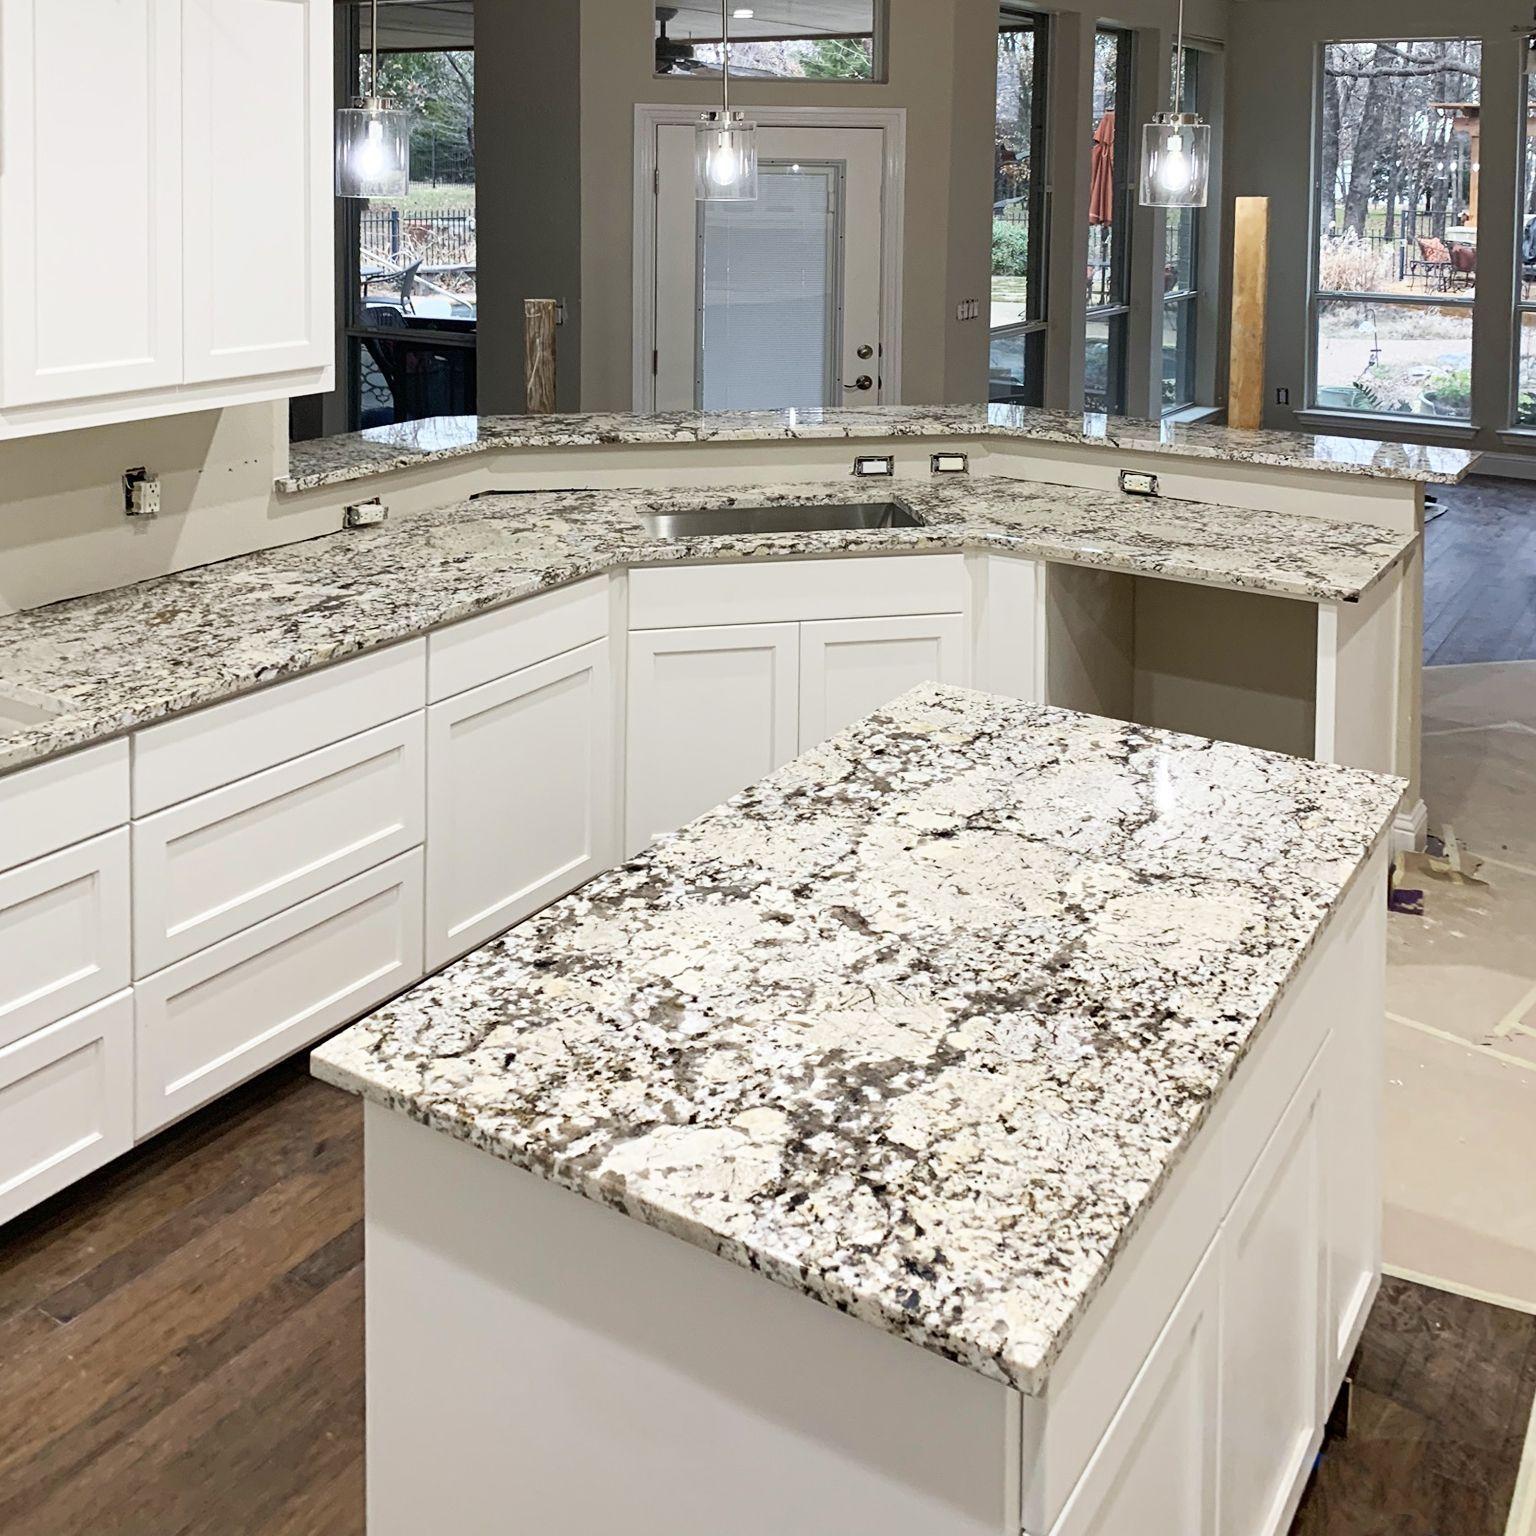 3cm Zurich Granite Countertops Granite Granitecountertops Graniteslab Graniteslabs Luxurym In 2020 Granite Countertops Custom Granite Countertops Granite Kitchen